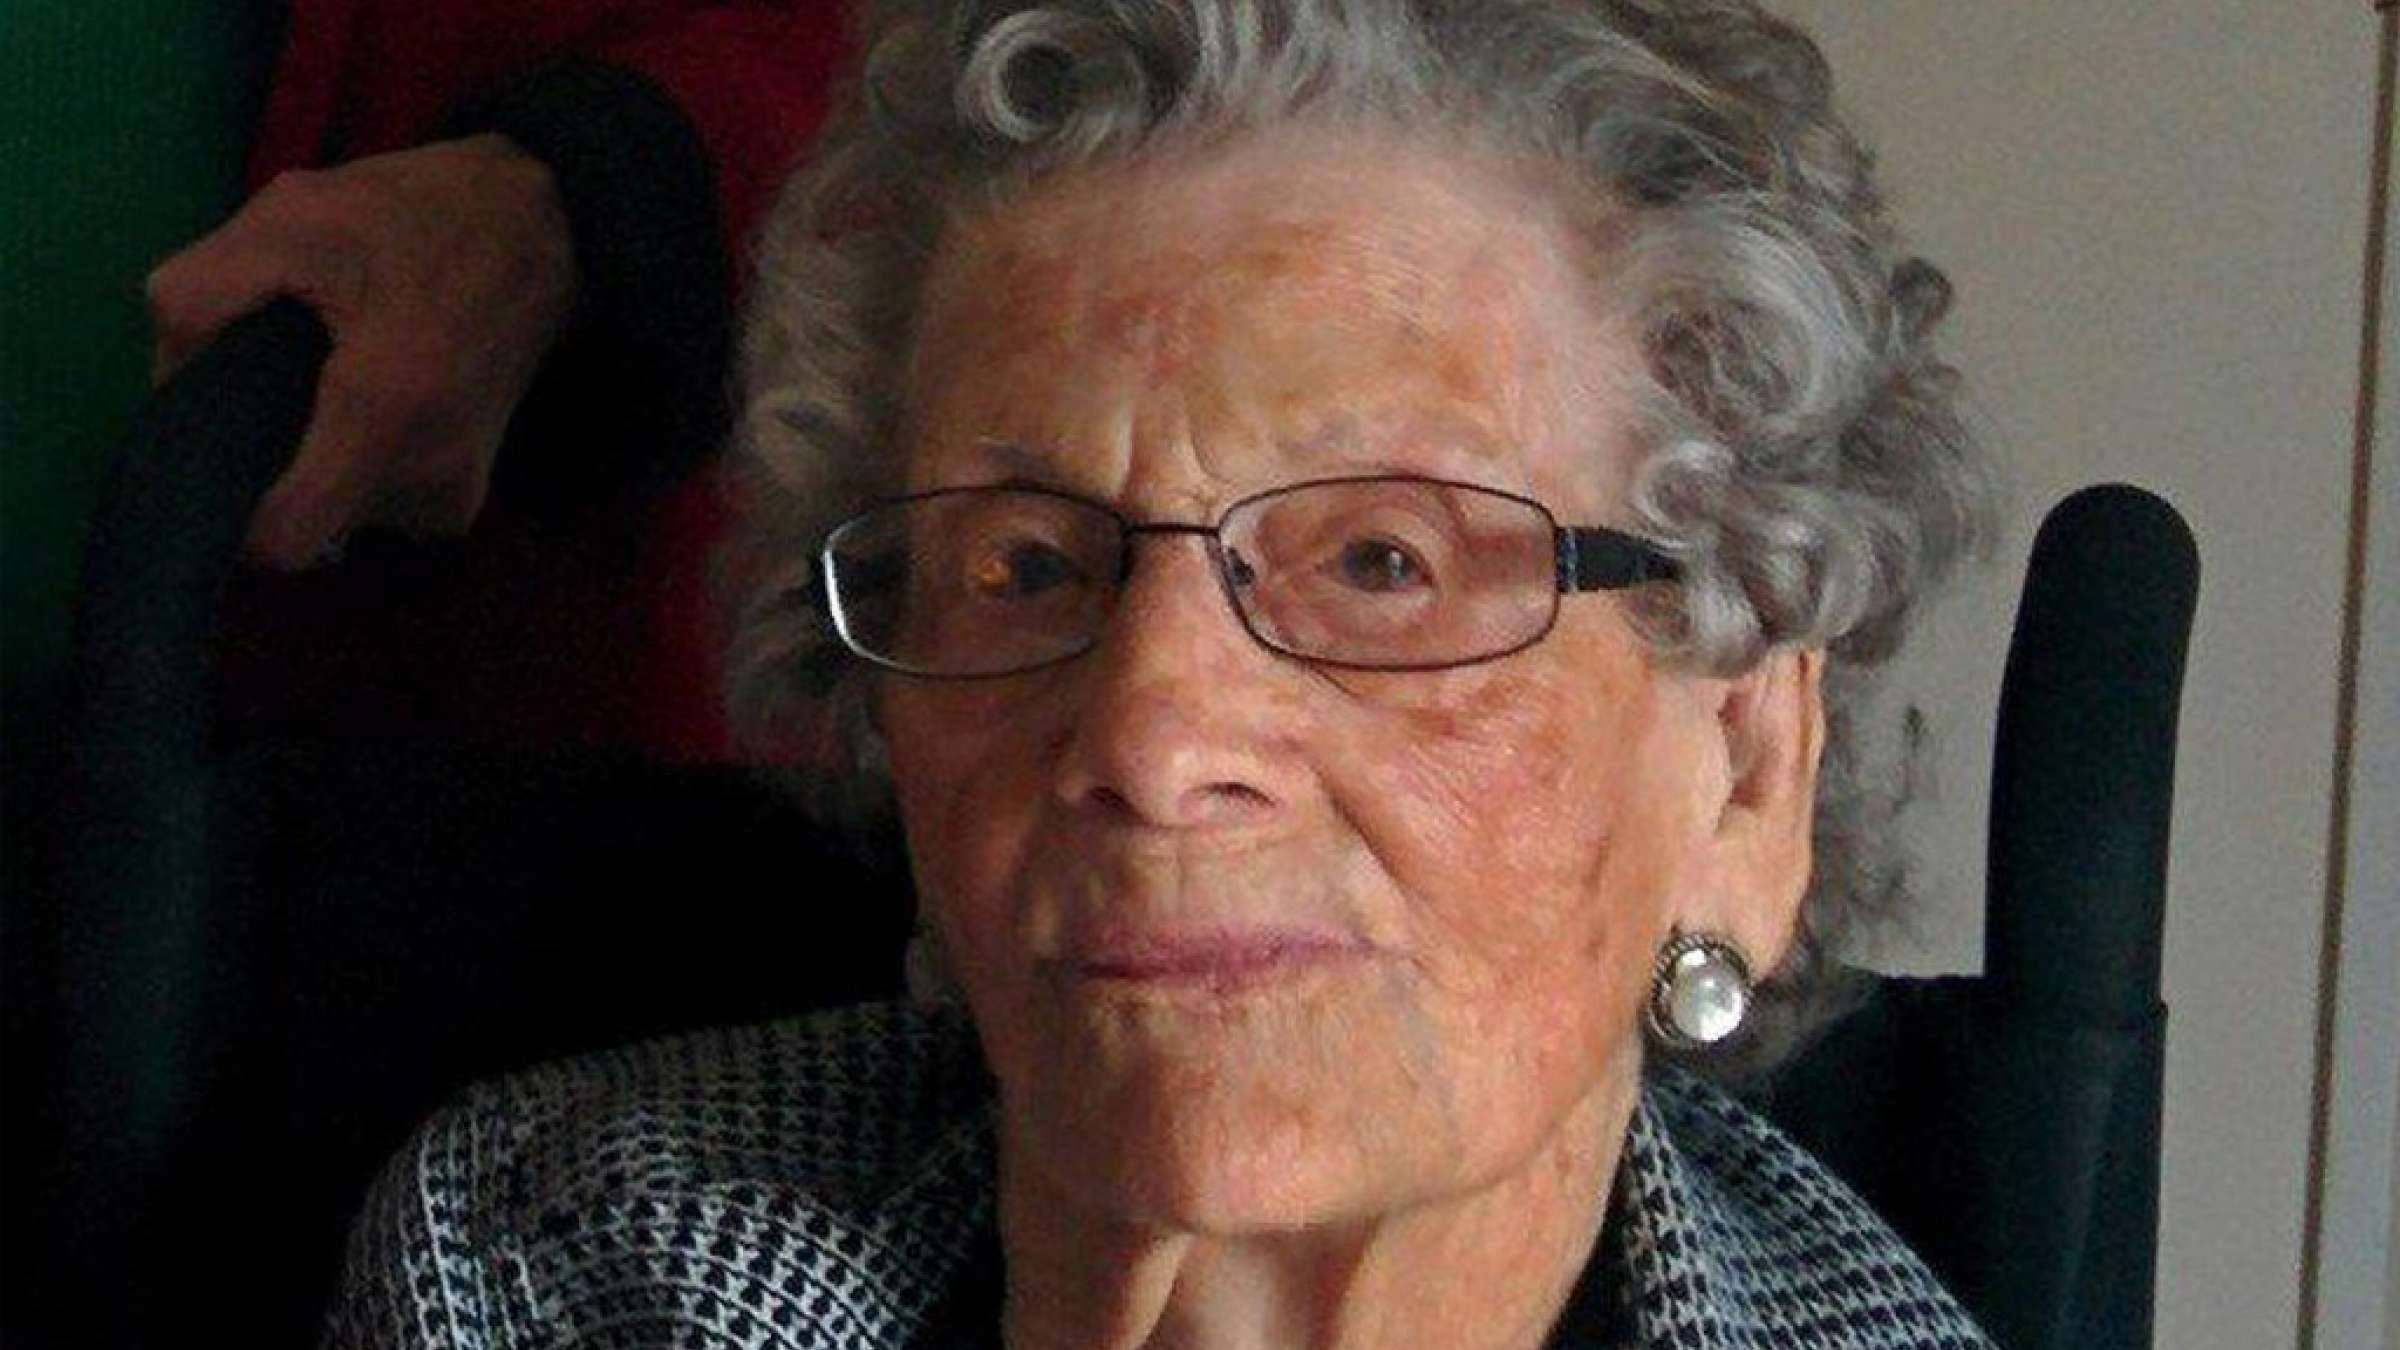 پیرترین-زن-کانادایی-در-114-سالگی-مُرد-کانادا-اخبار